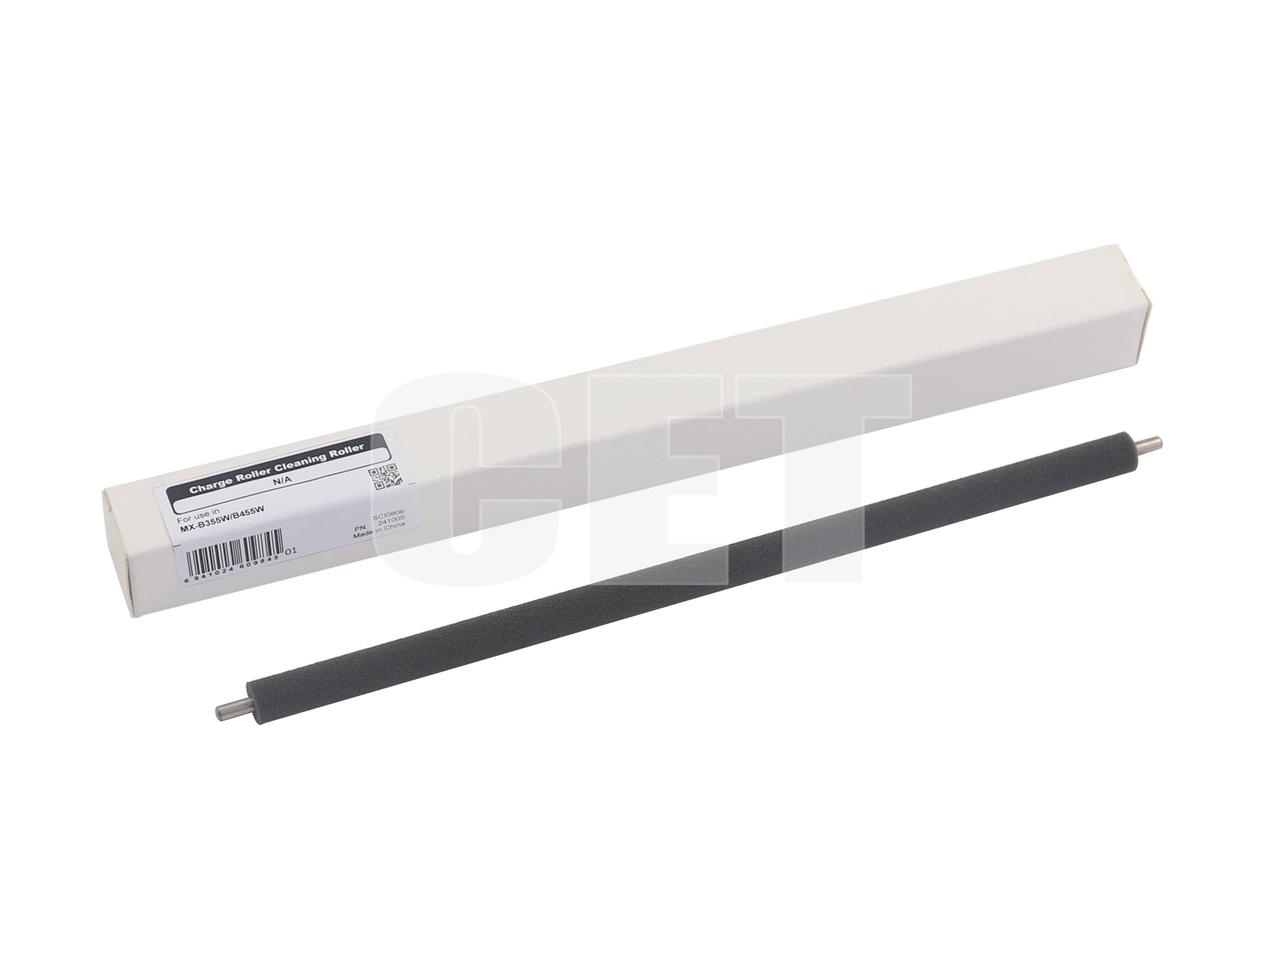 Ролик очистки ролика заряда для SHARP MX-B355W/455W(CET), CET241005